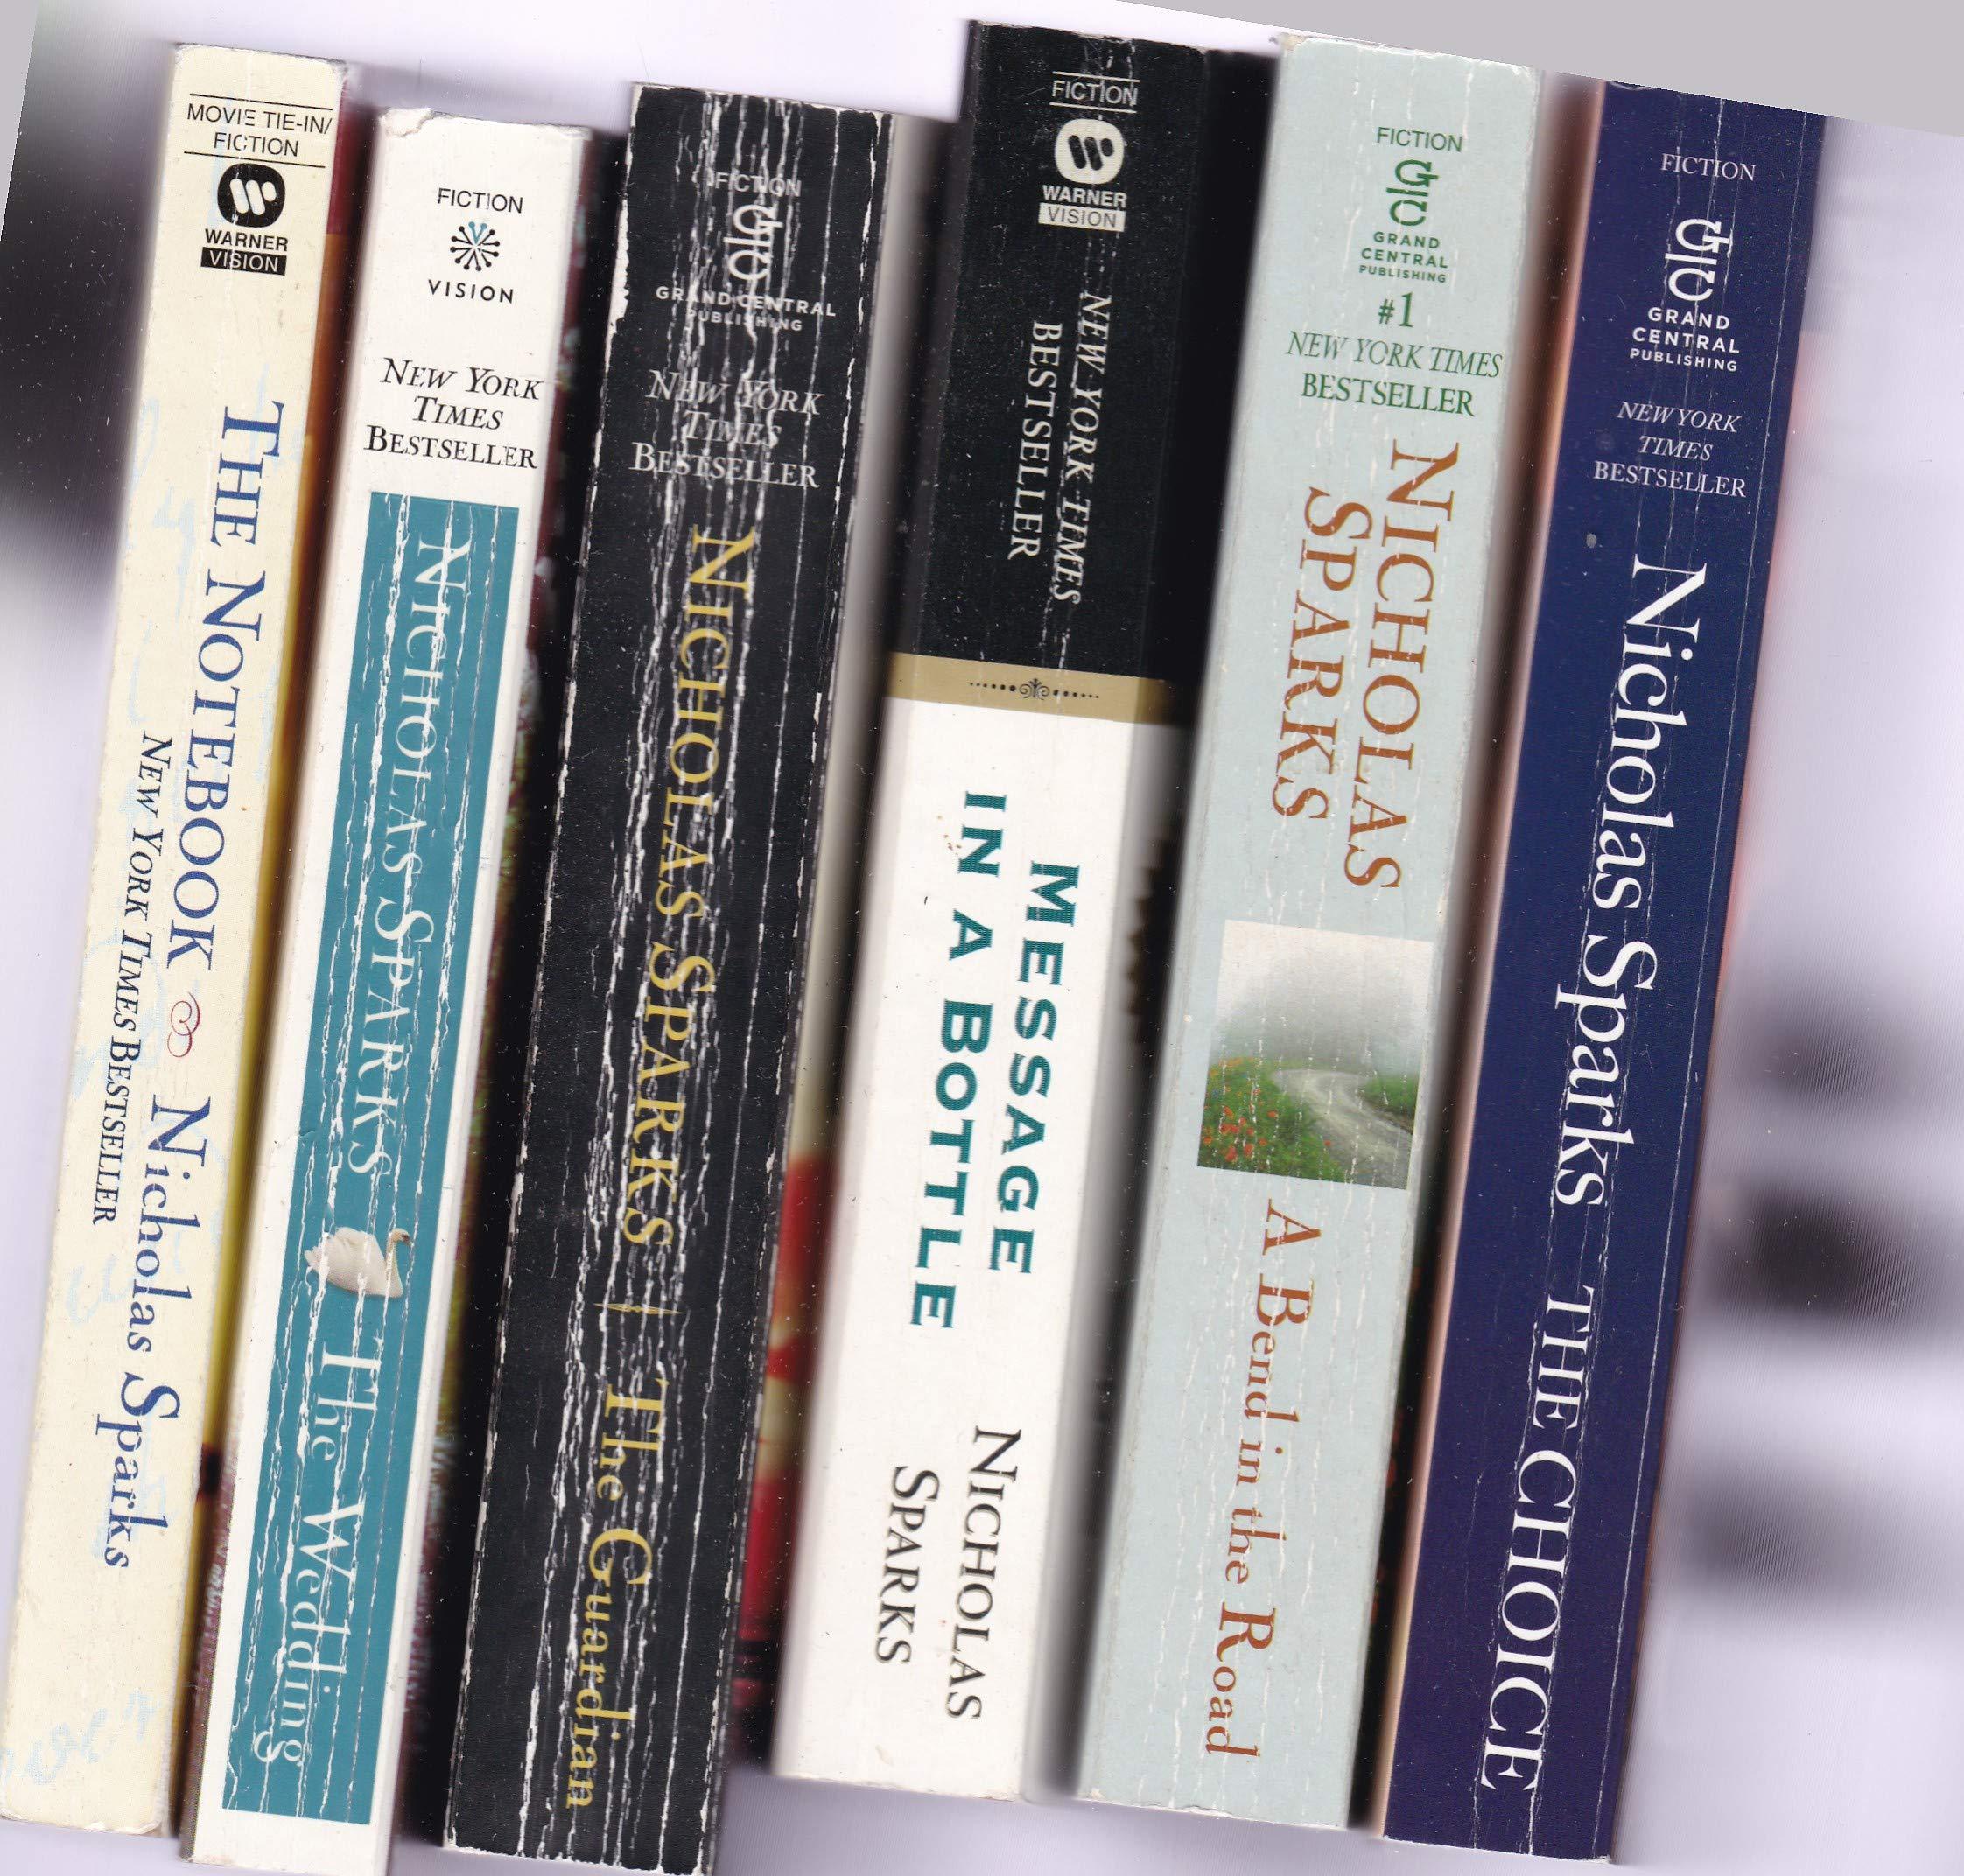 Nicholas Sparks 14 paperback books